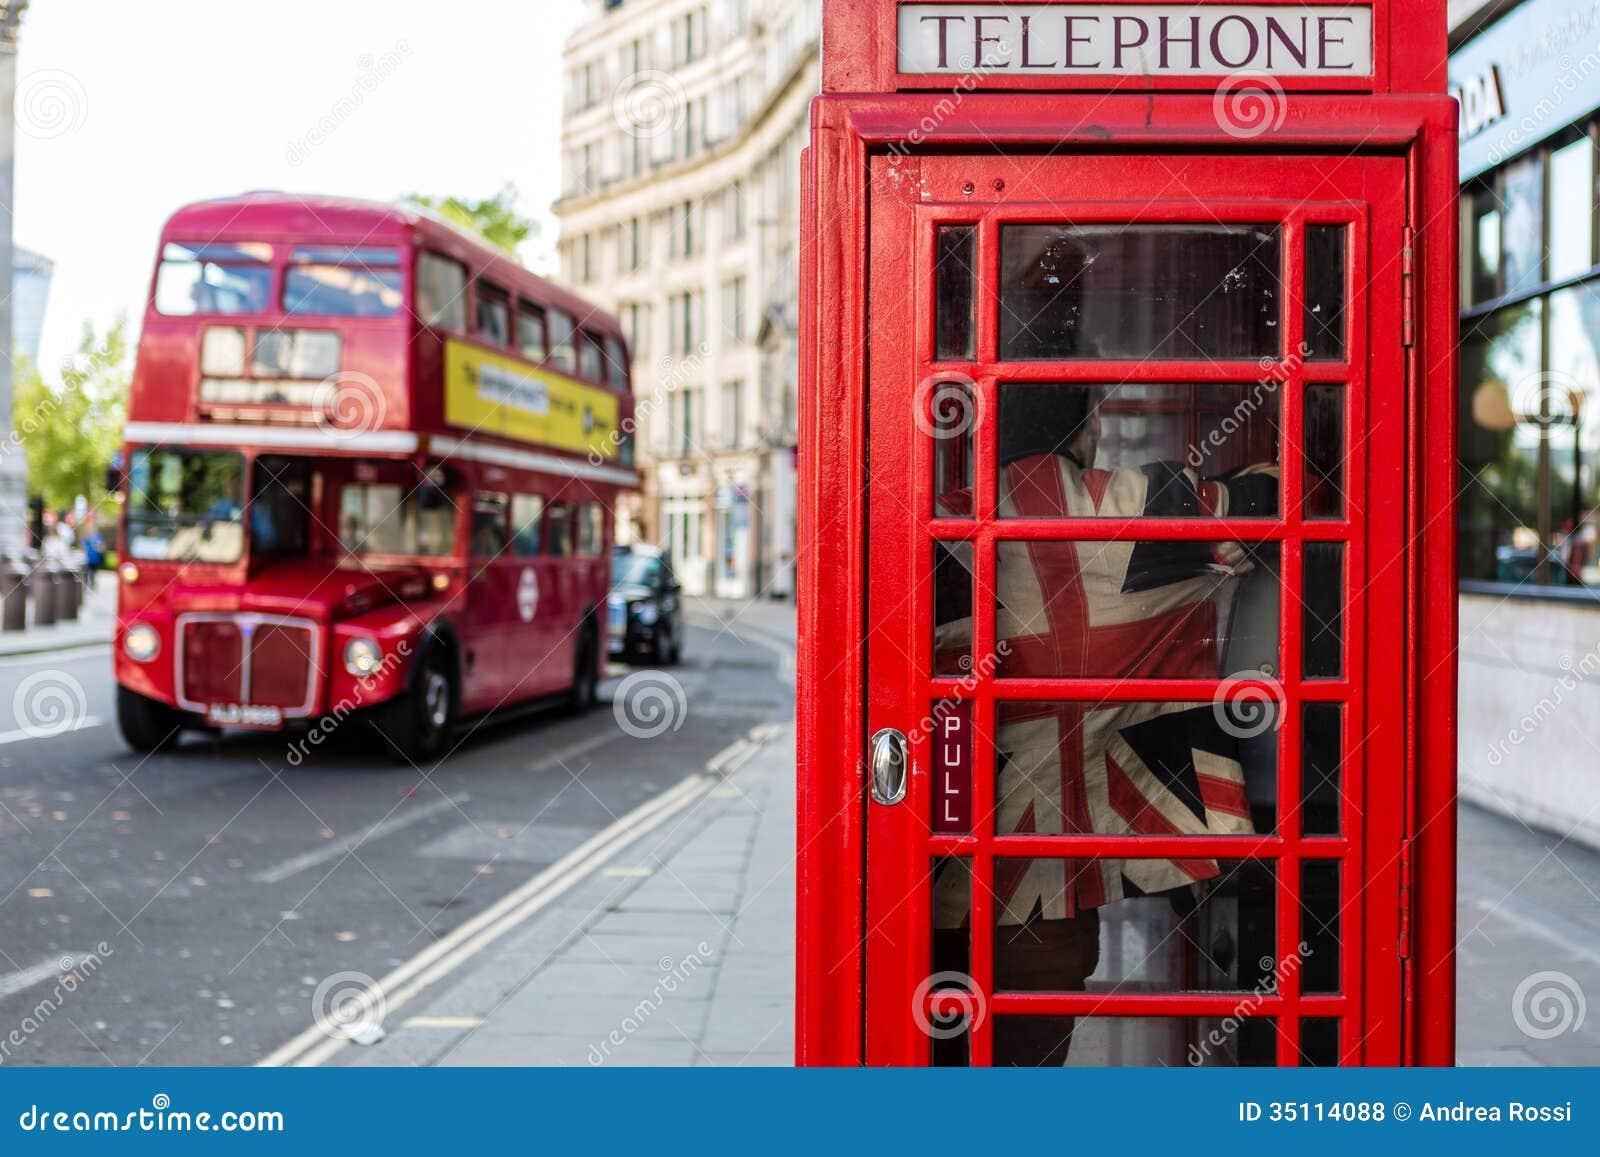 London Calling Royalty Free Stock Photos Image 35114088